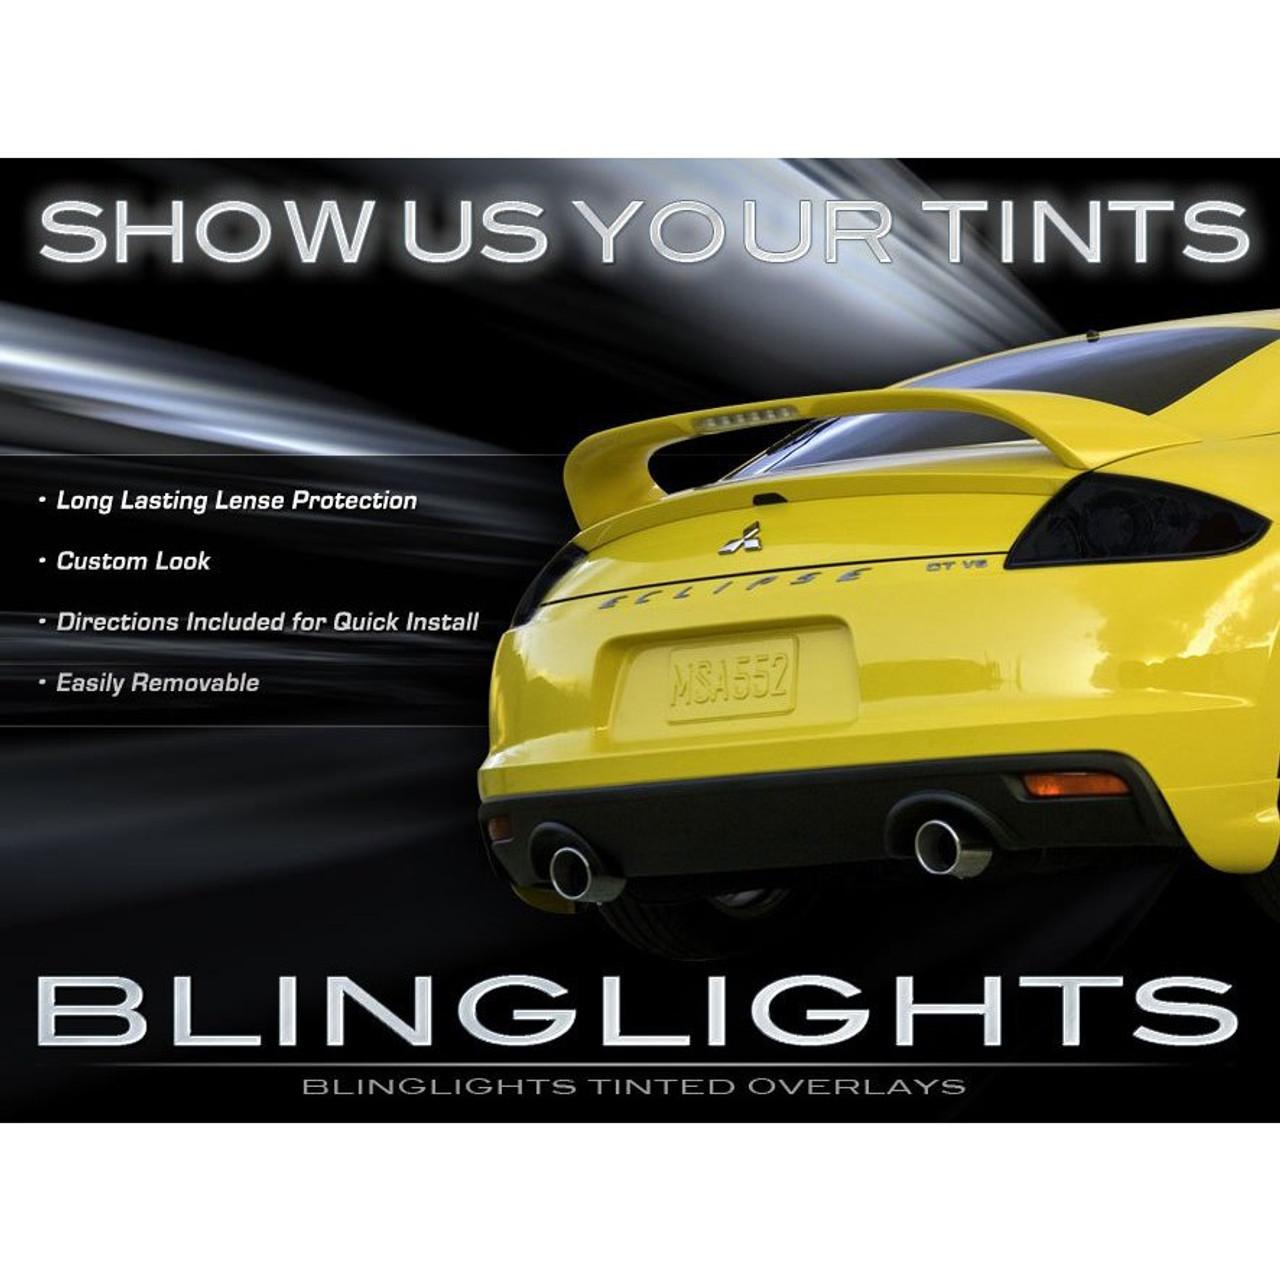 09-12 Mitsubishi Eclipse Tinted Smoked Tail Lamp Lights Overlays Film Protection Kit